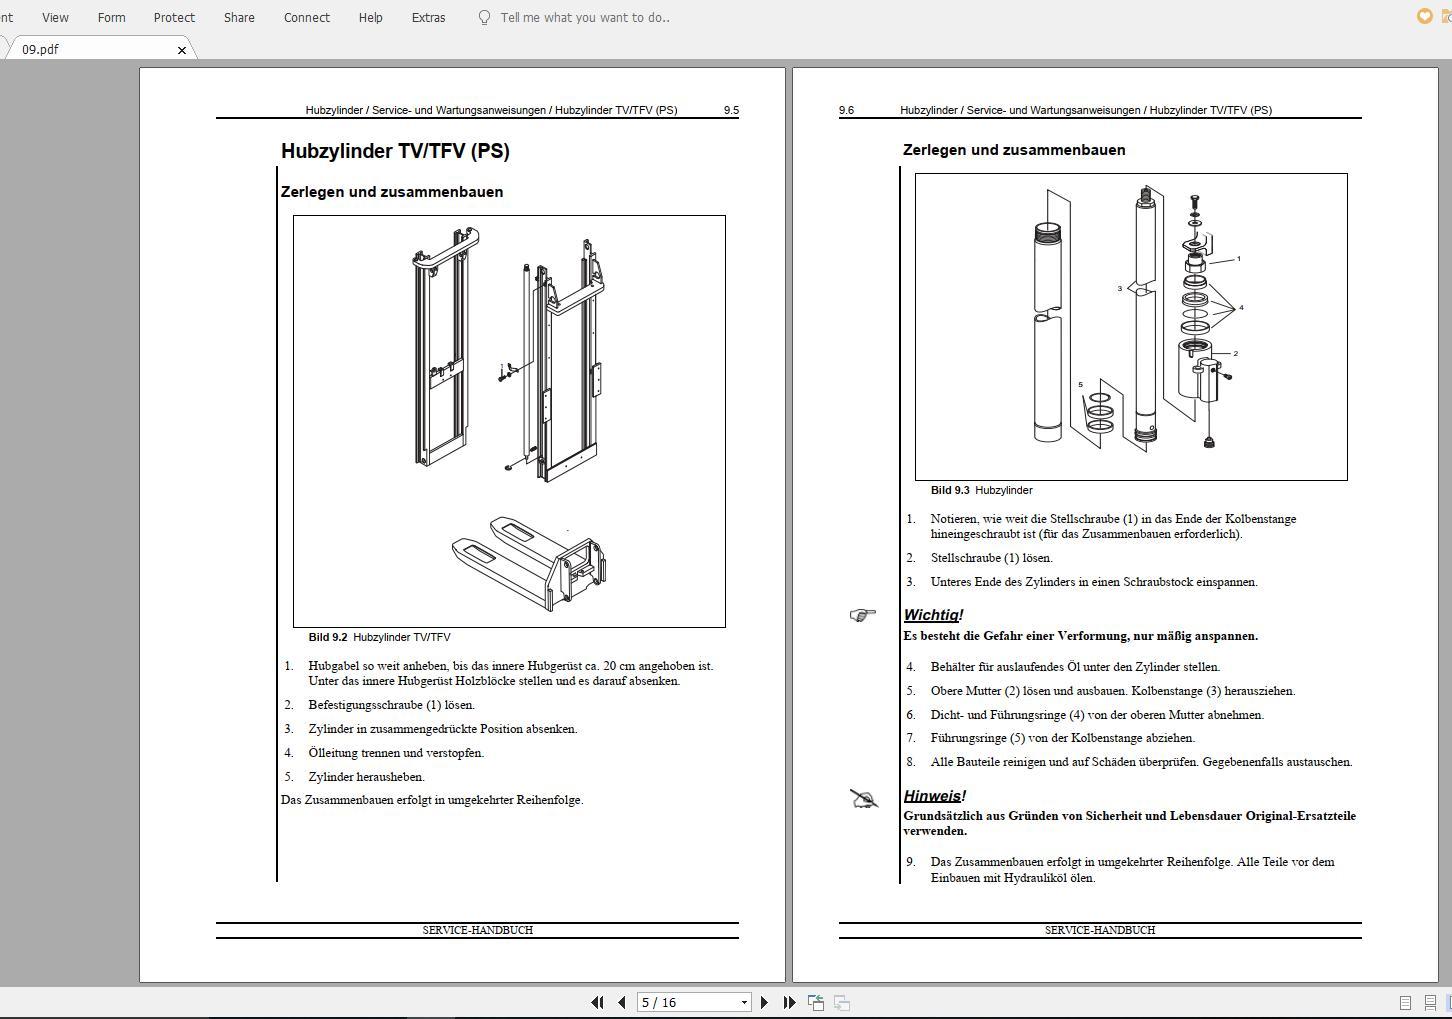 Nissan_Forklift_Warehouse_PS_119029-119030_Service_ManualENDE_4